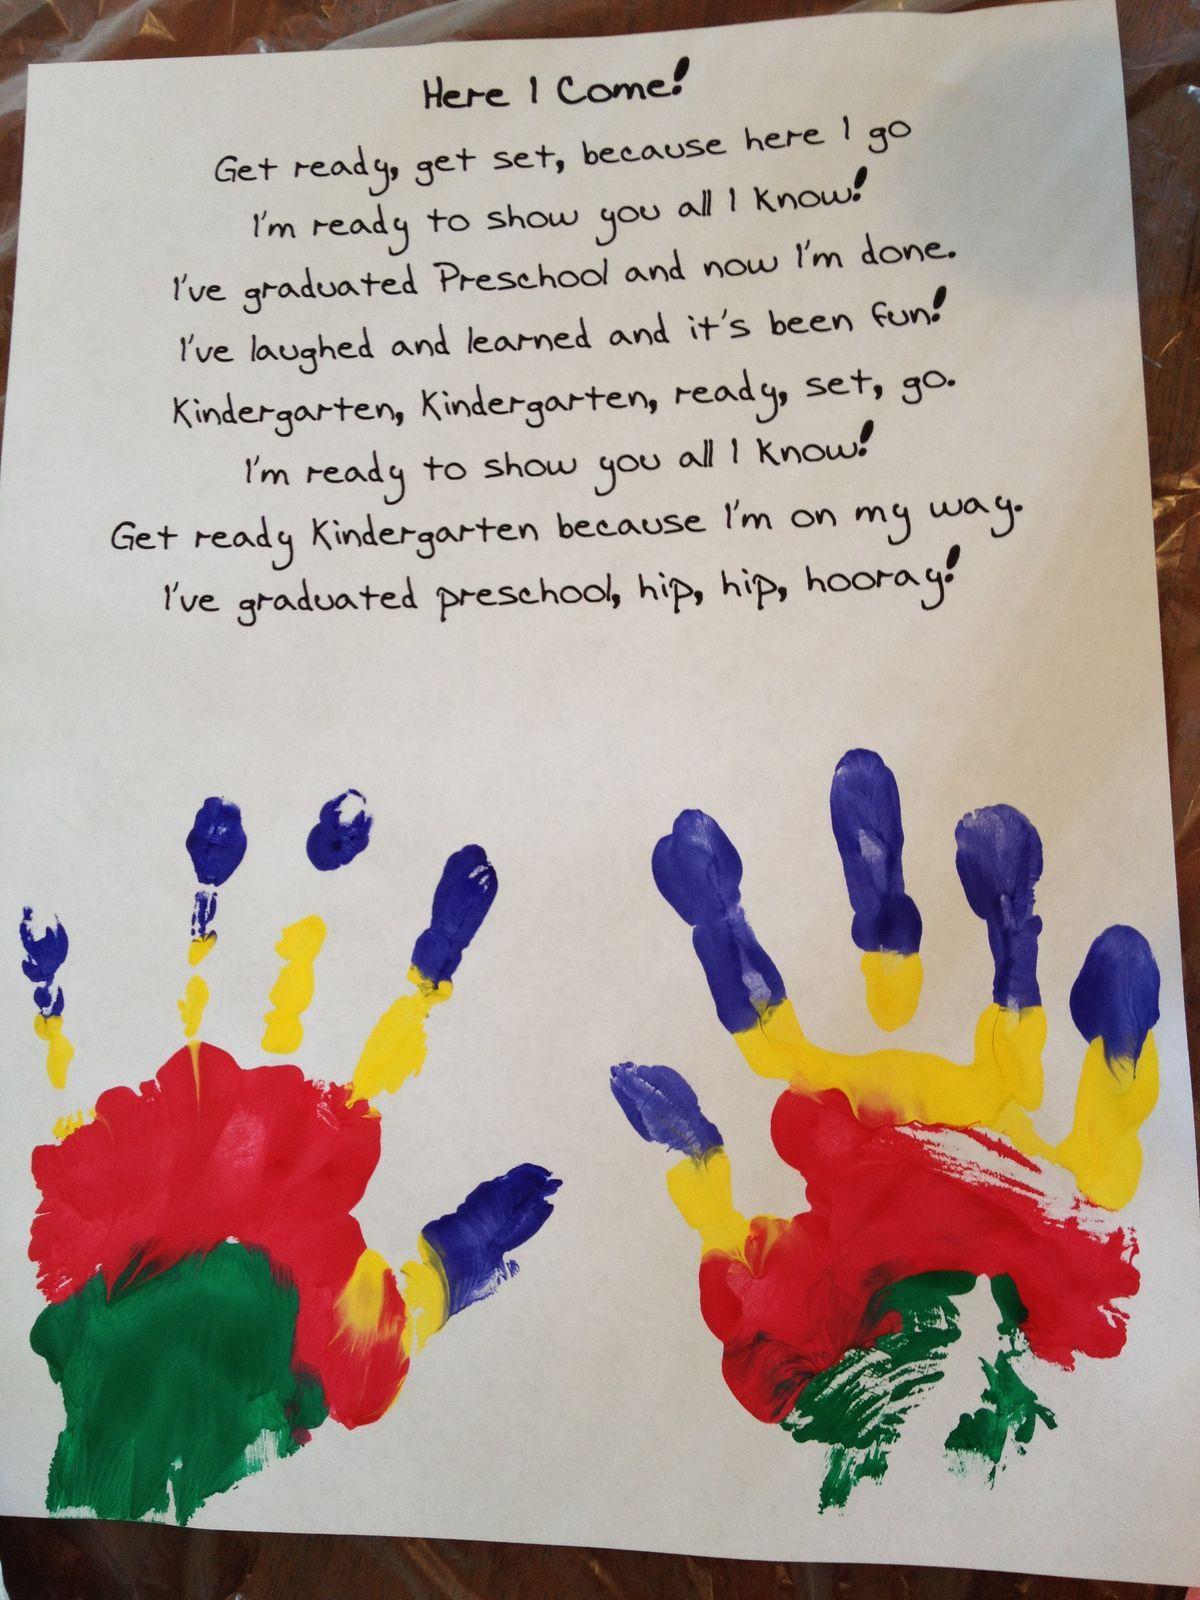 71cef7ccd7bb7fd52cb55a73cf8a239f - Kindergarten Graduation Gift Ideas